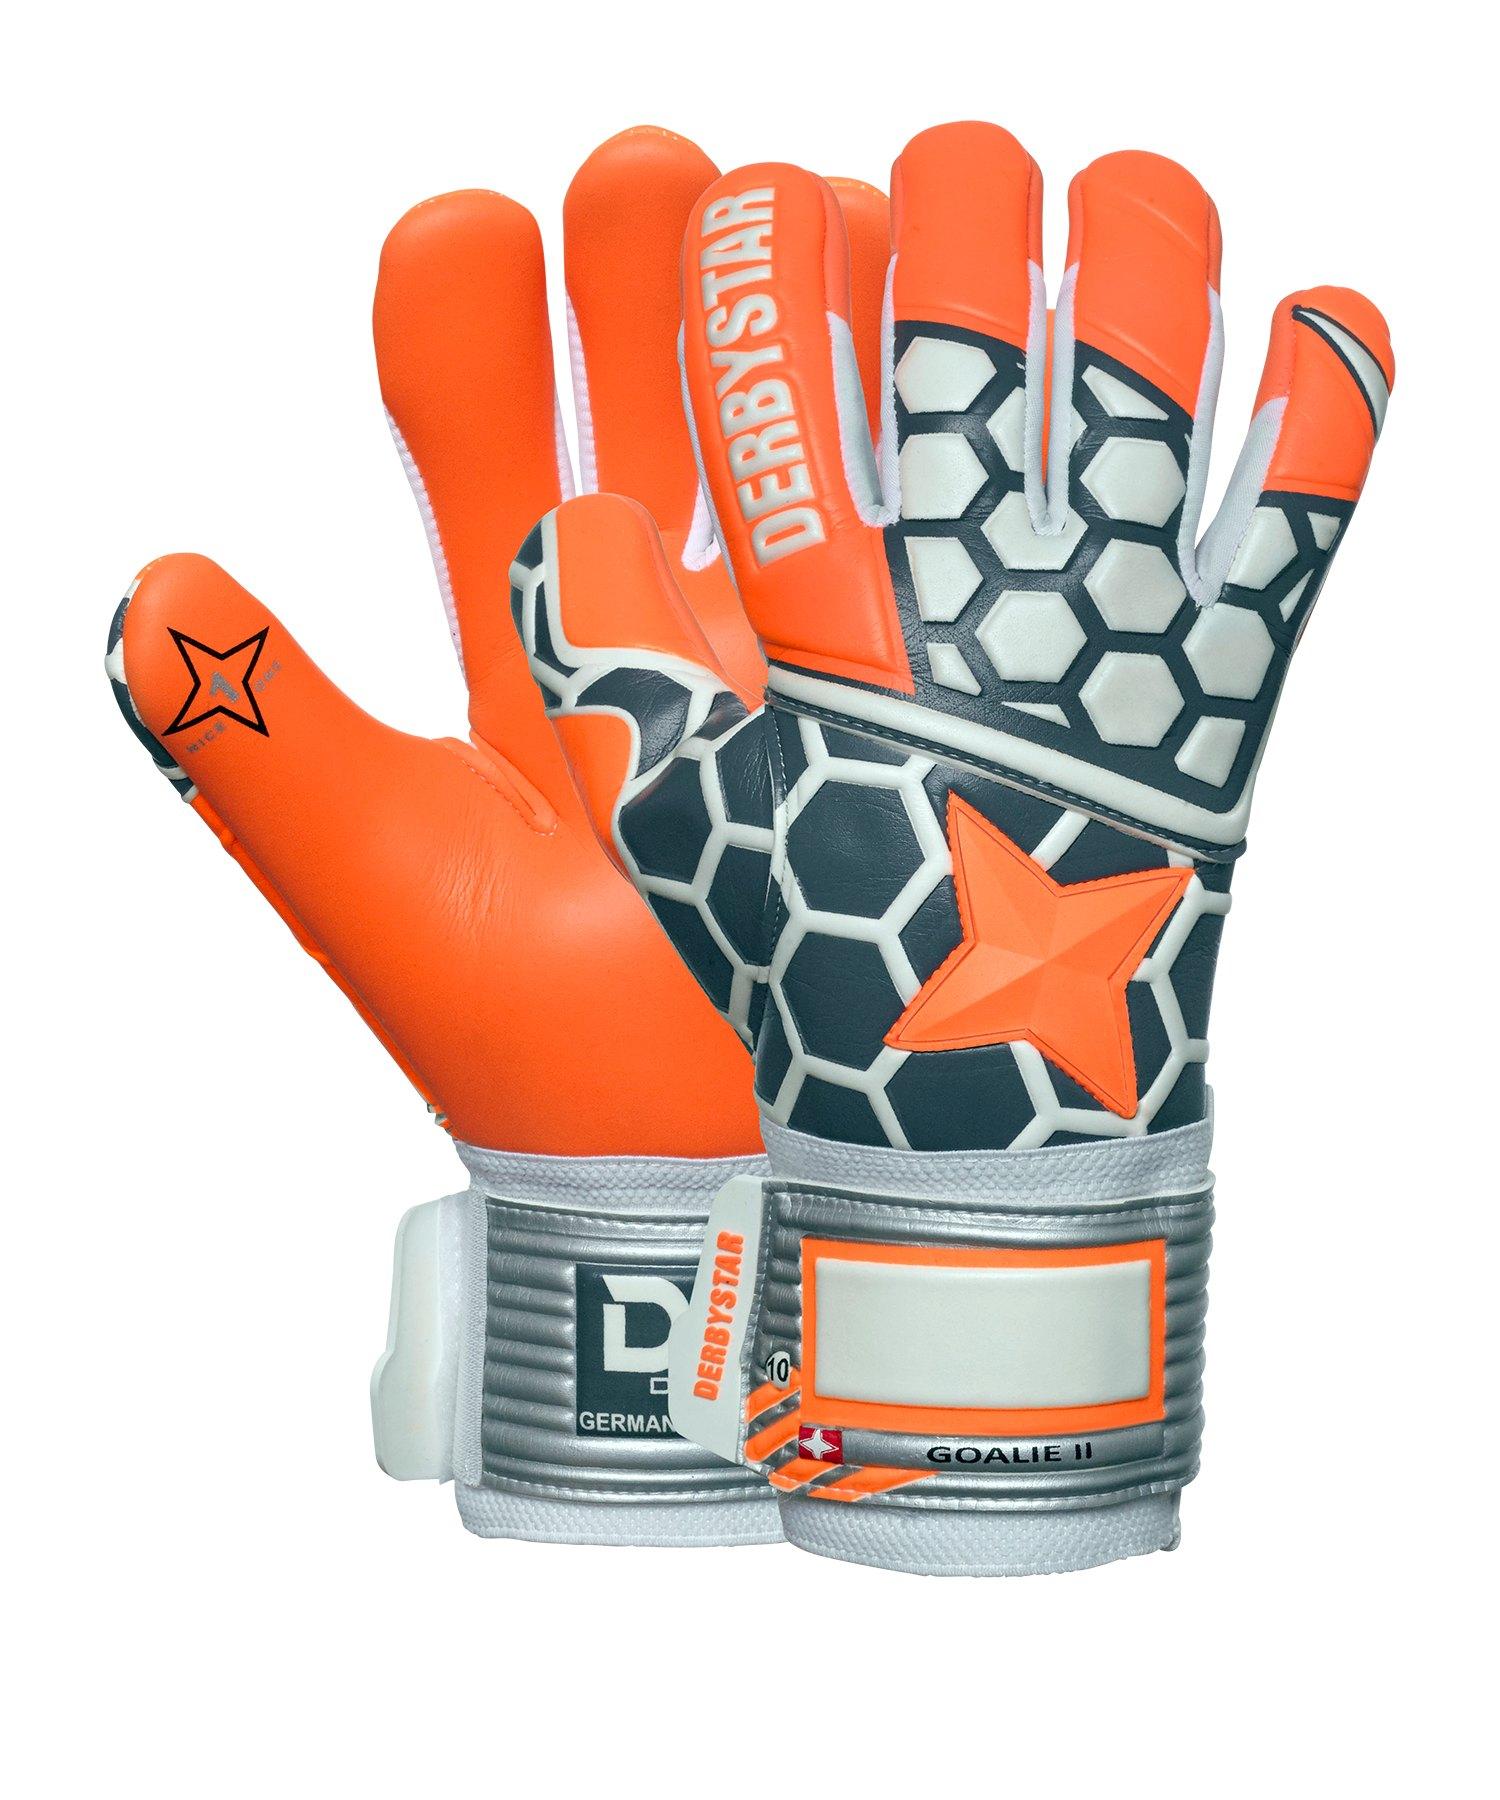 Derbystar Goalie II Torwarthandschuh Orange Grau - orange